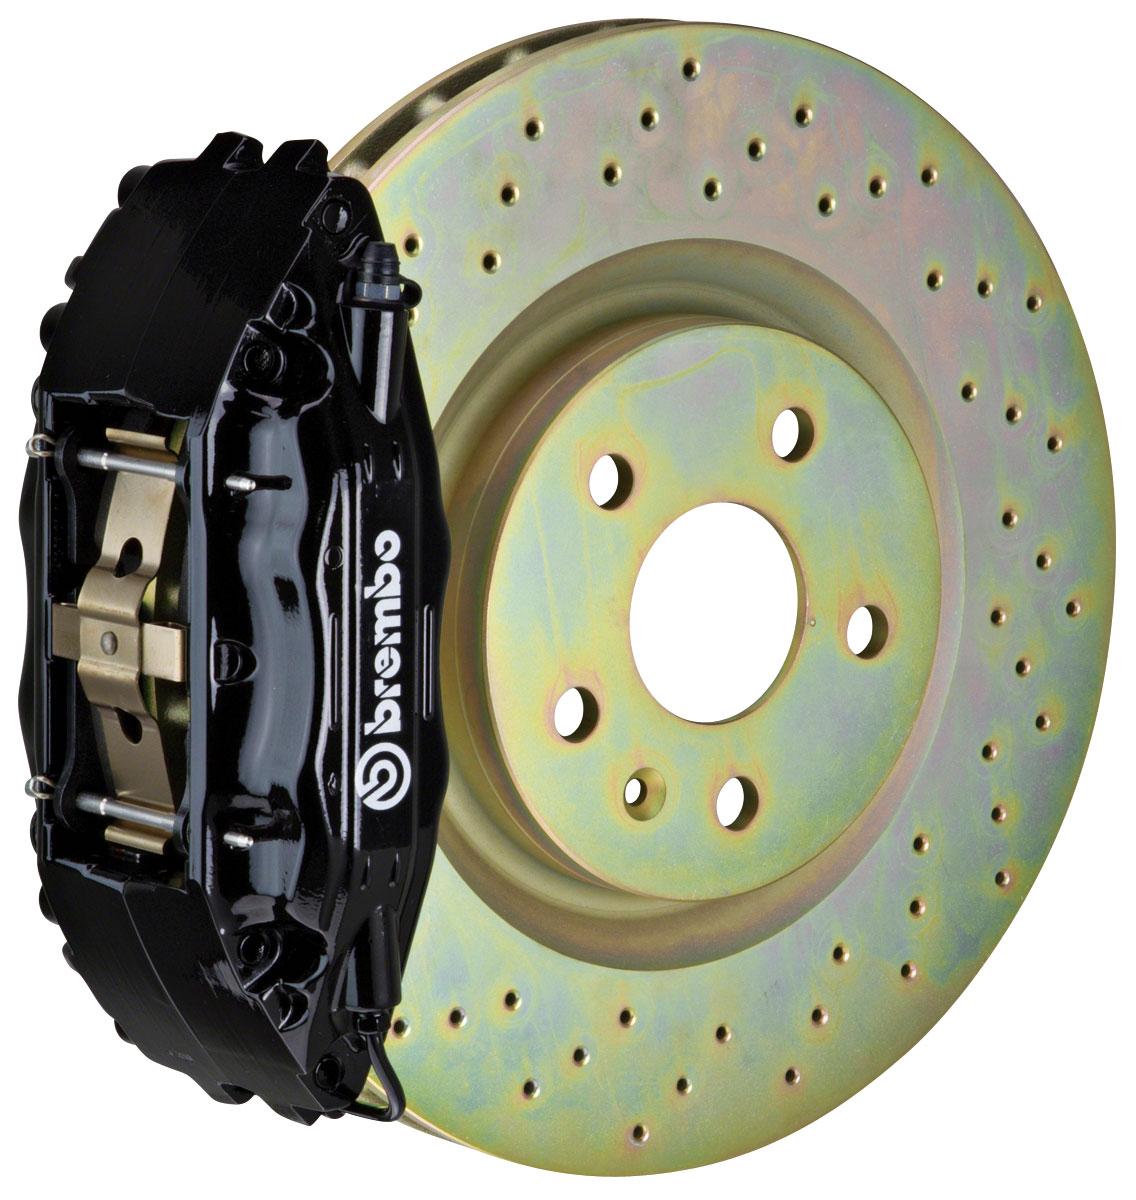 Brake Set, Brembo GT, 2004-09 XLR/XLR-V, Front, 1pc 355mm Rotors, 2pc 4P Caliper